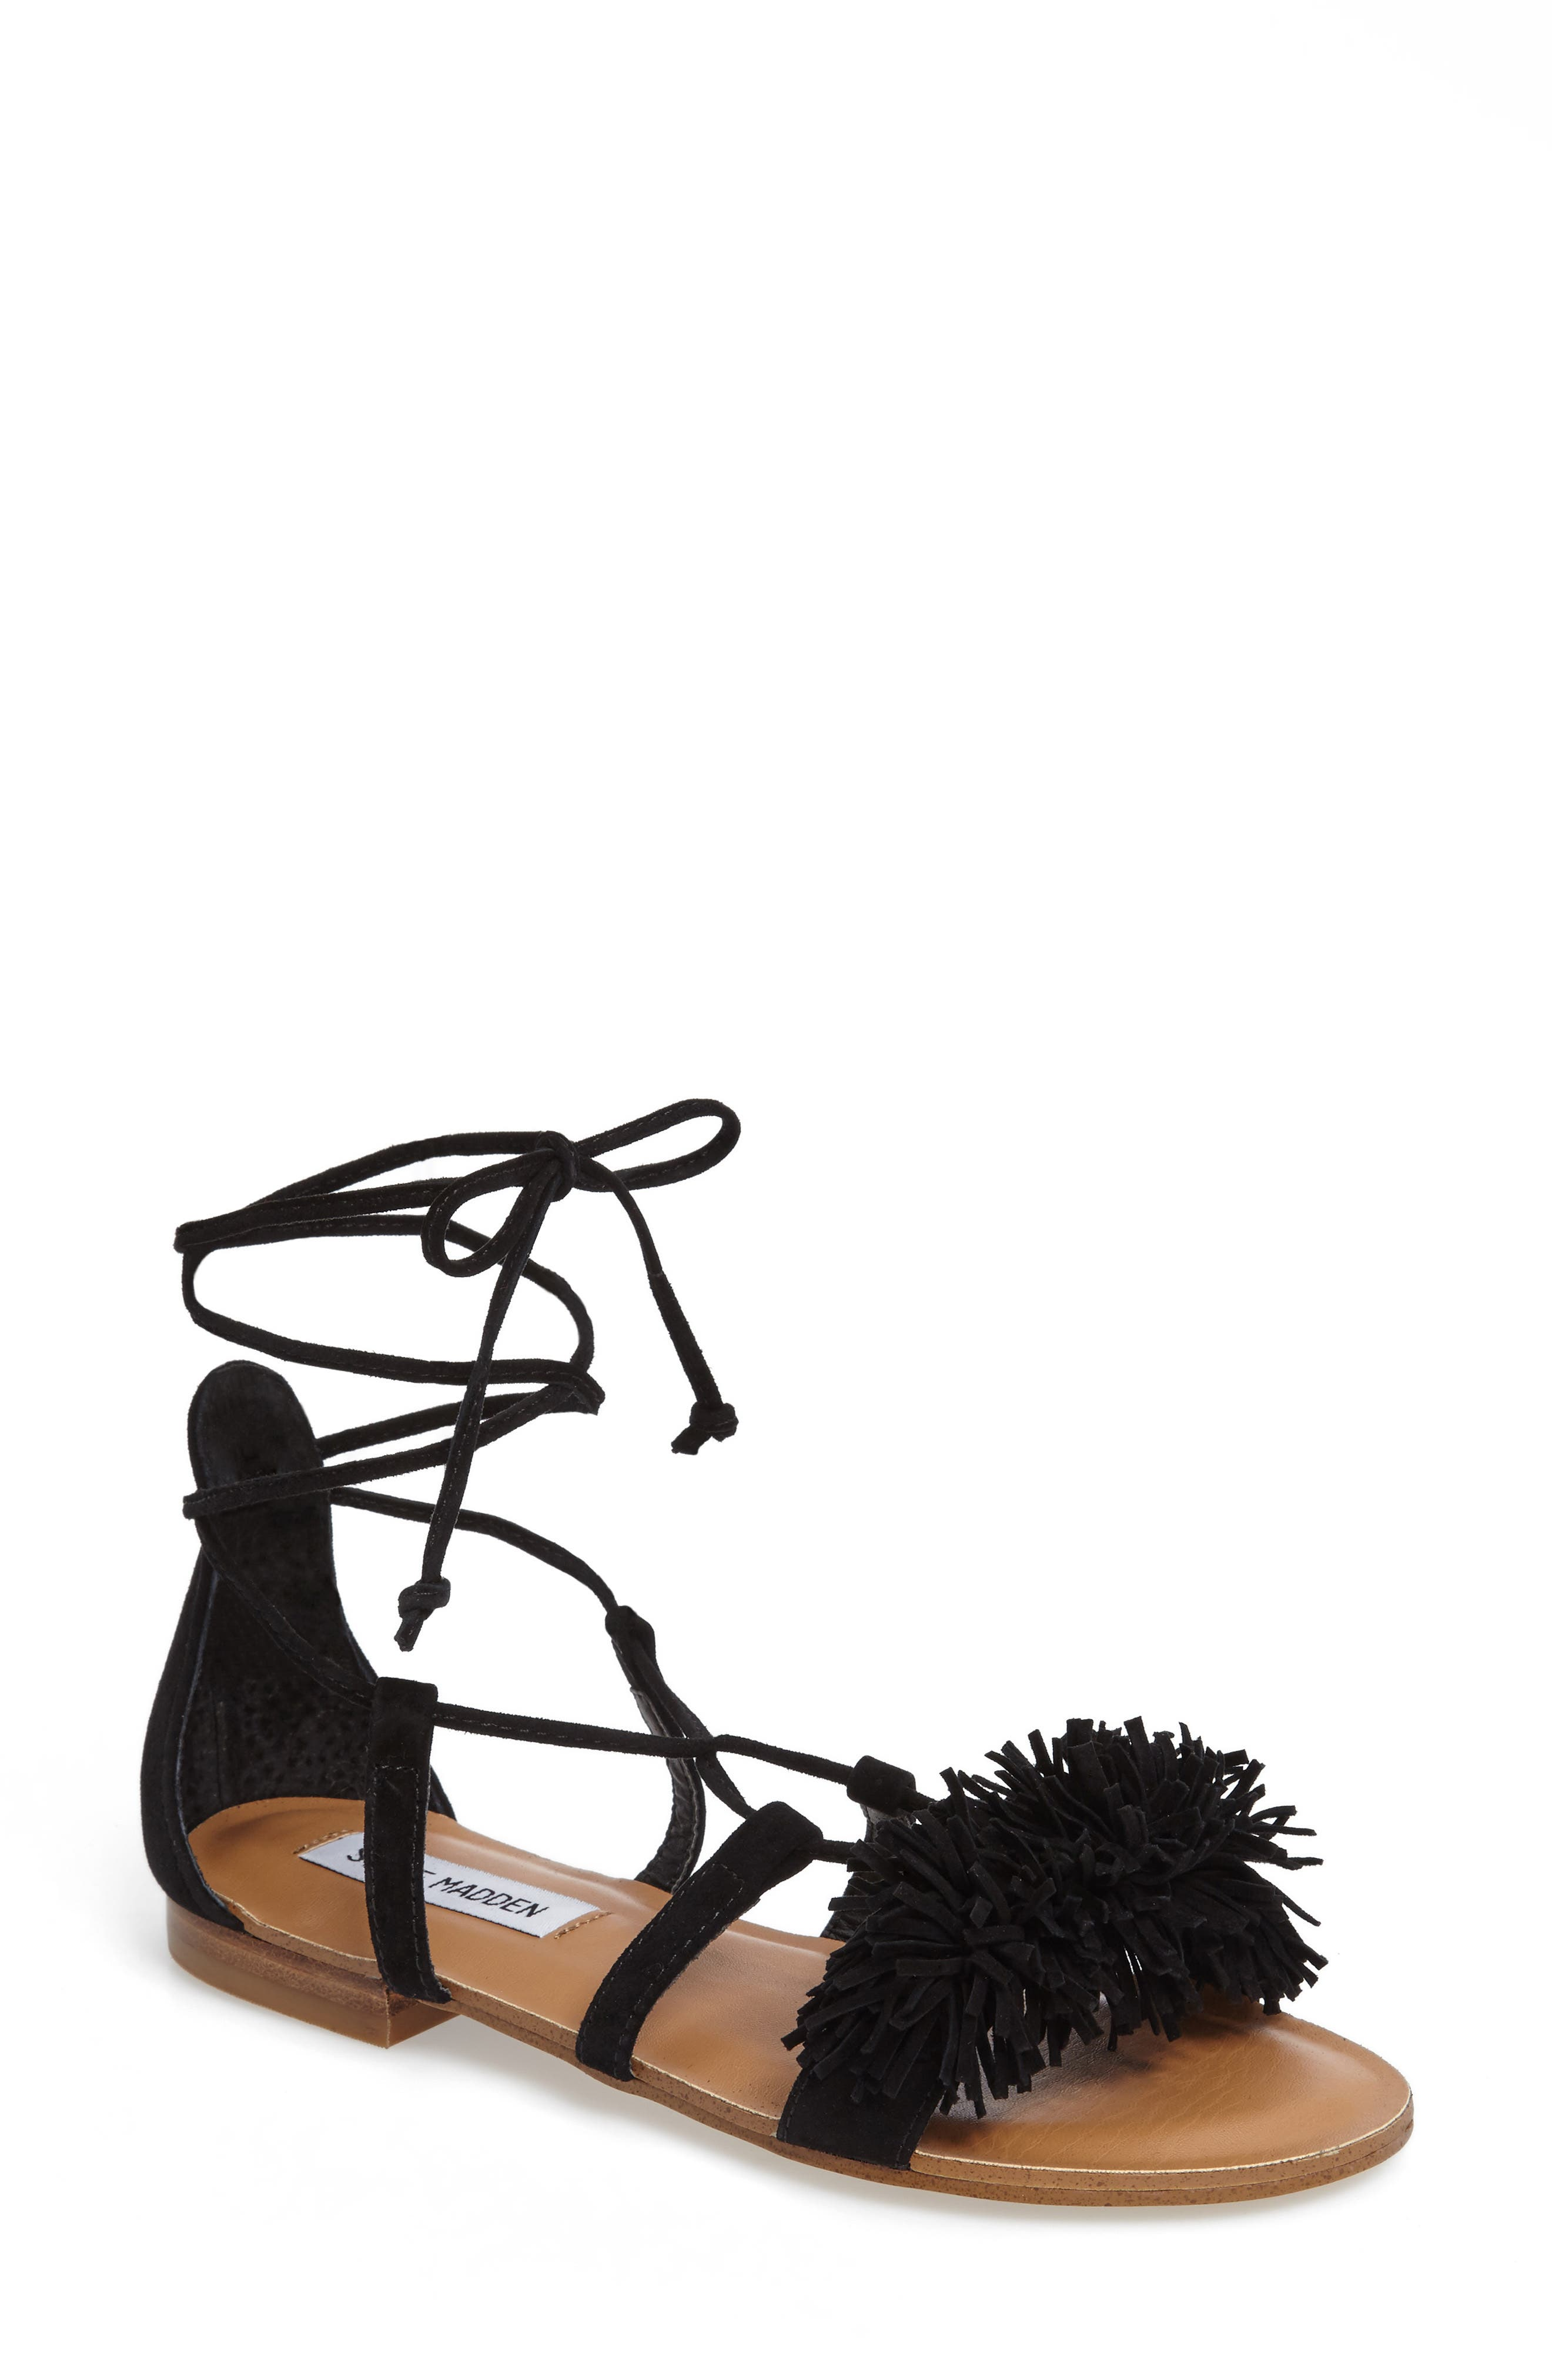 Main Image - Steve Madden Swizzle Lace-Up Sandal (Women)